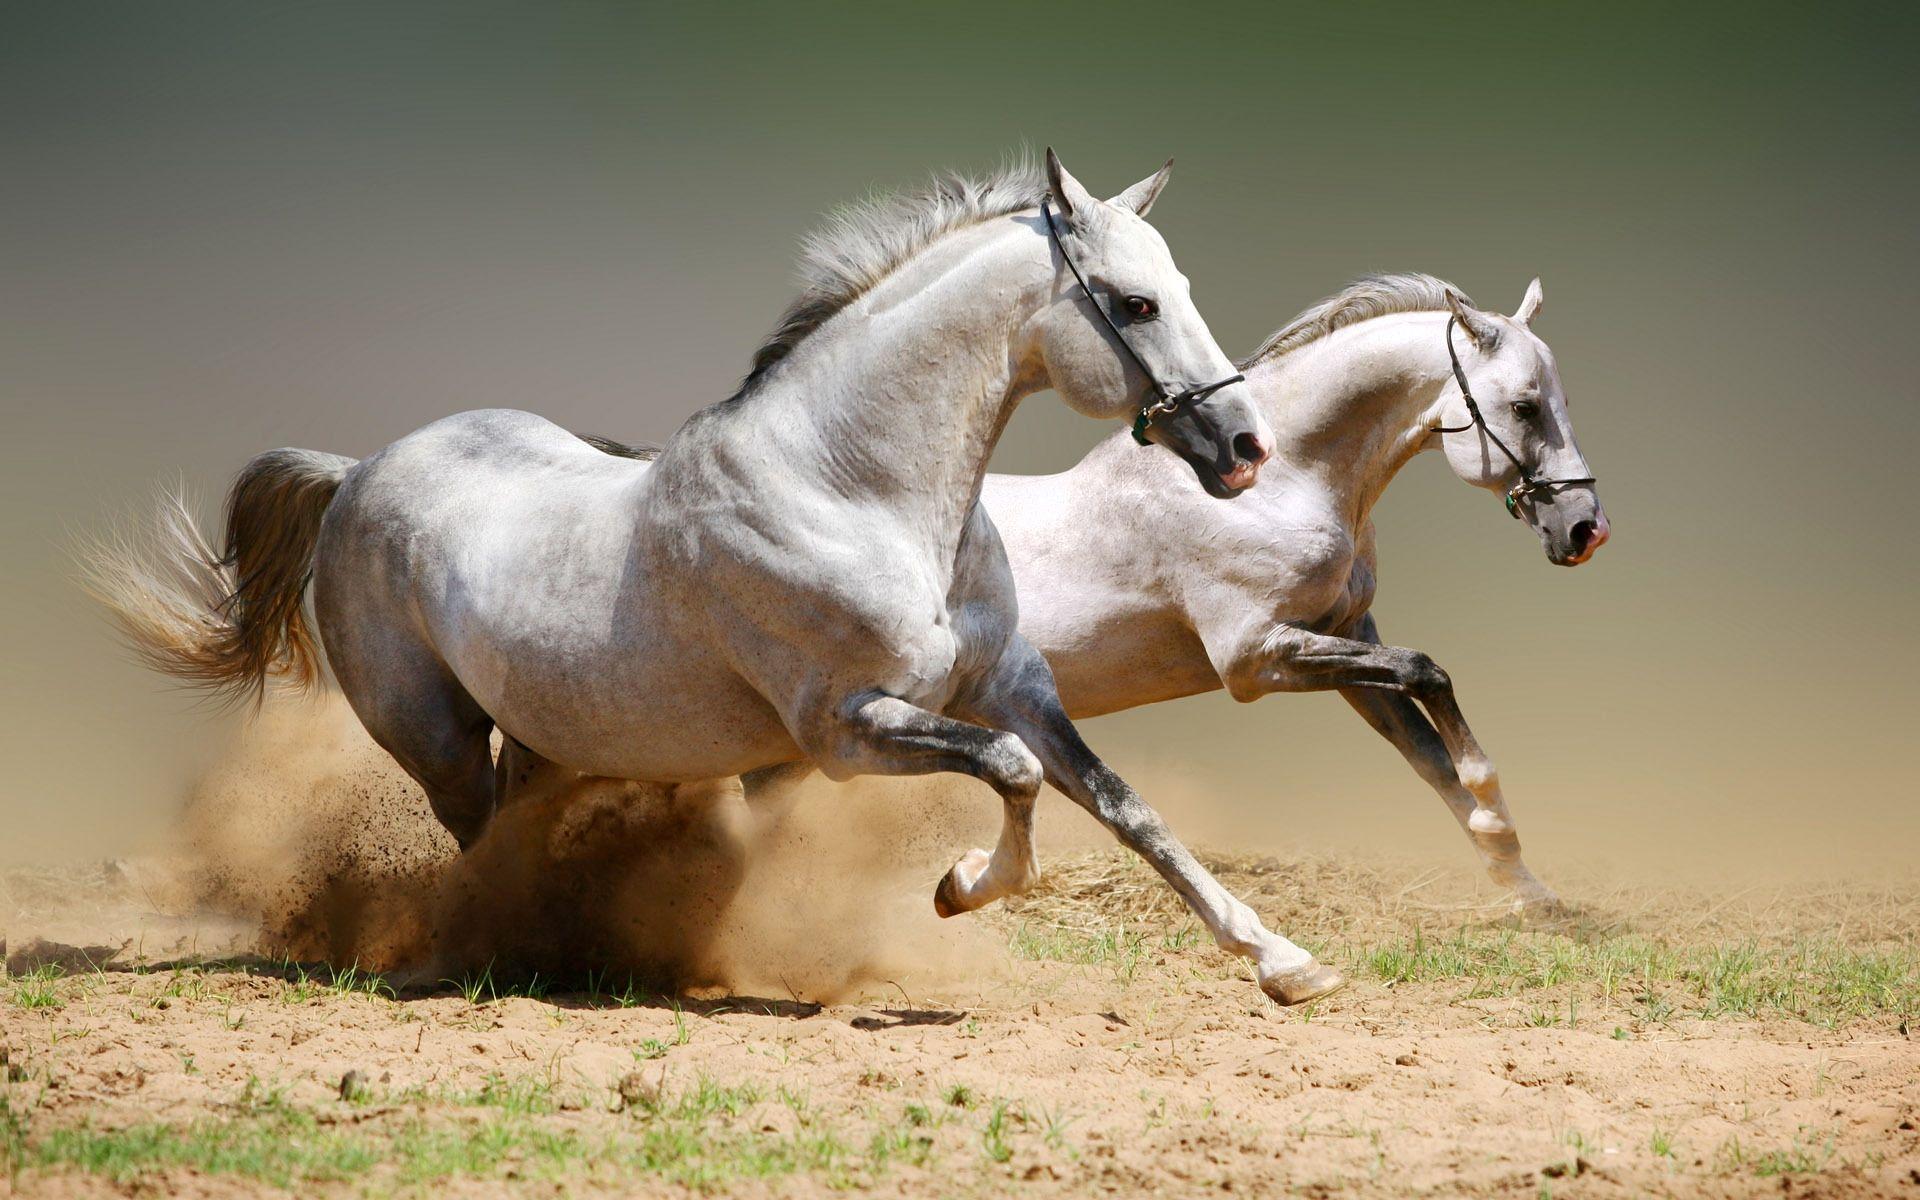 Simple Wallpaper Horse Photography - cff2c35ddb4418d1a0e106fd348405bf  Photograph_152118.jpg